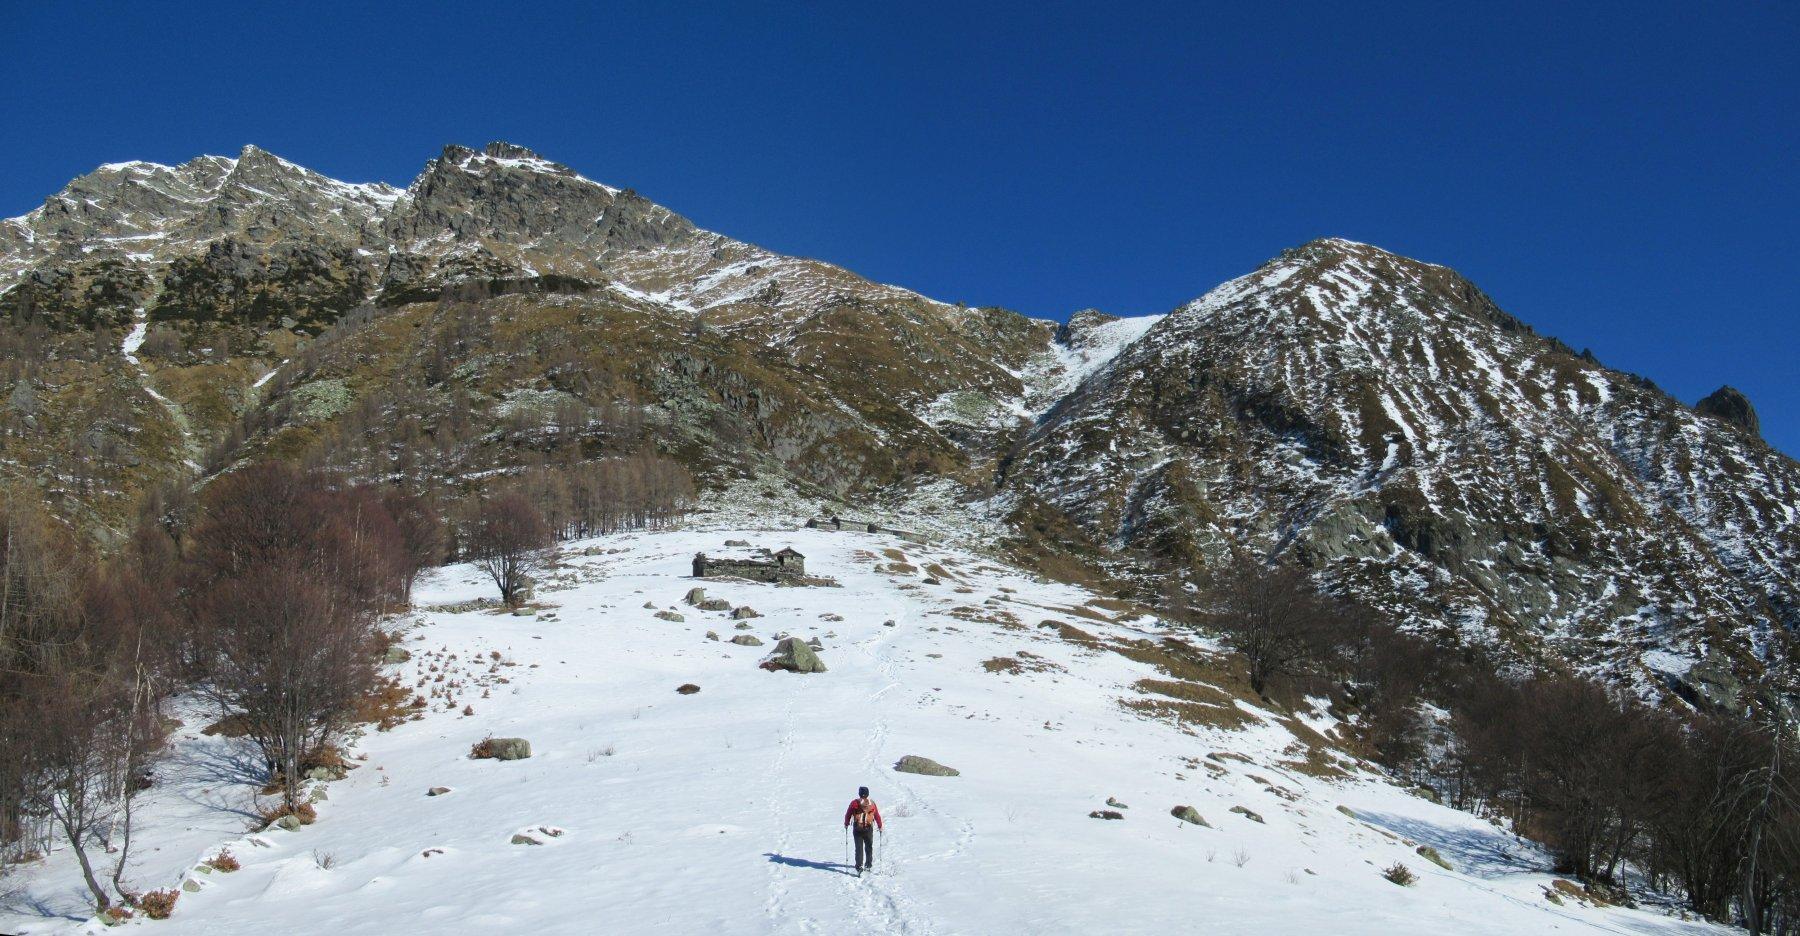 Arrio all'alpe Attia